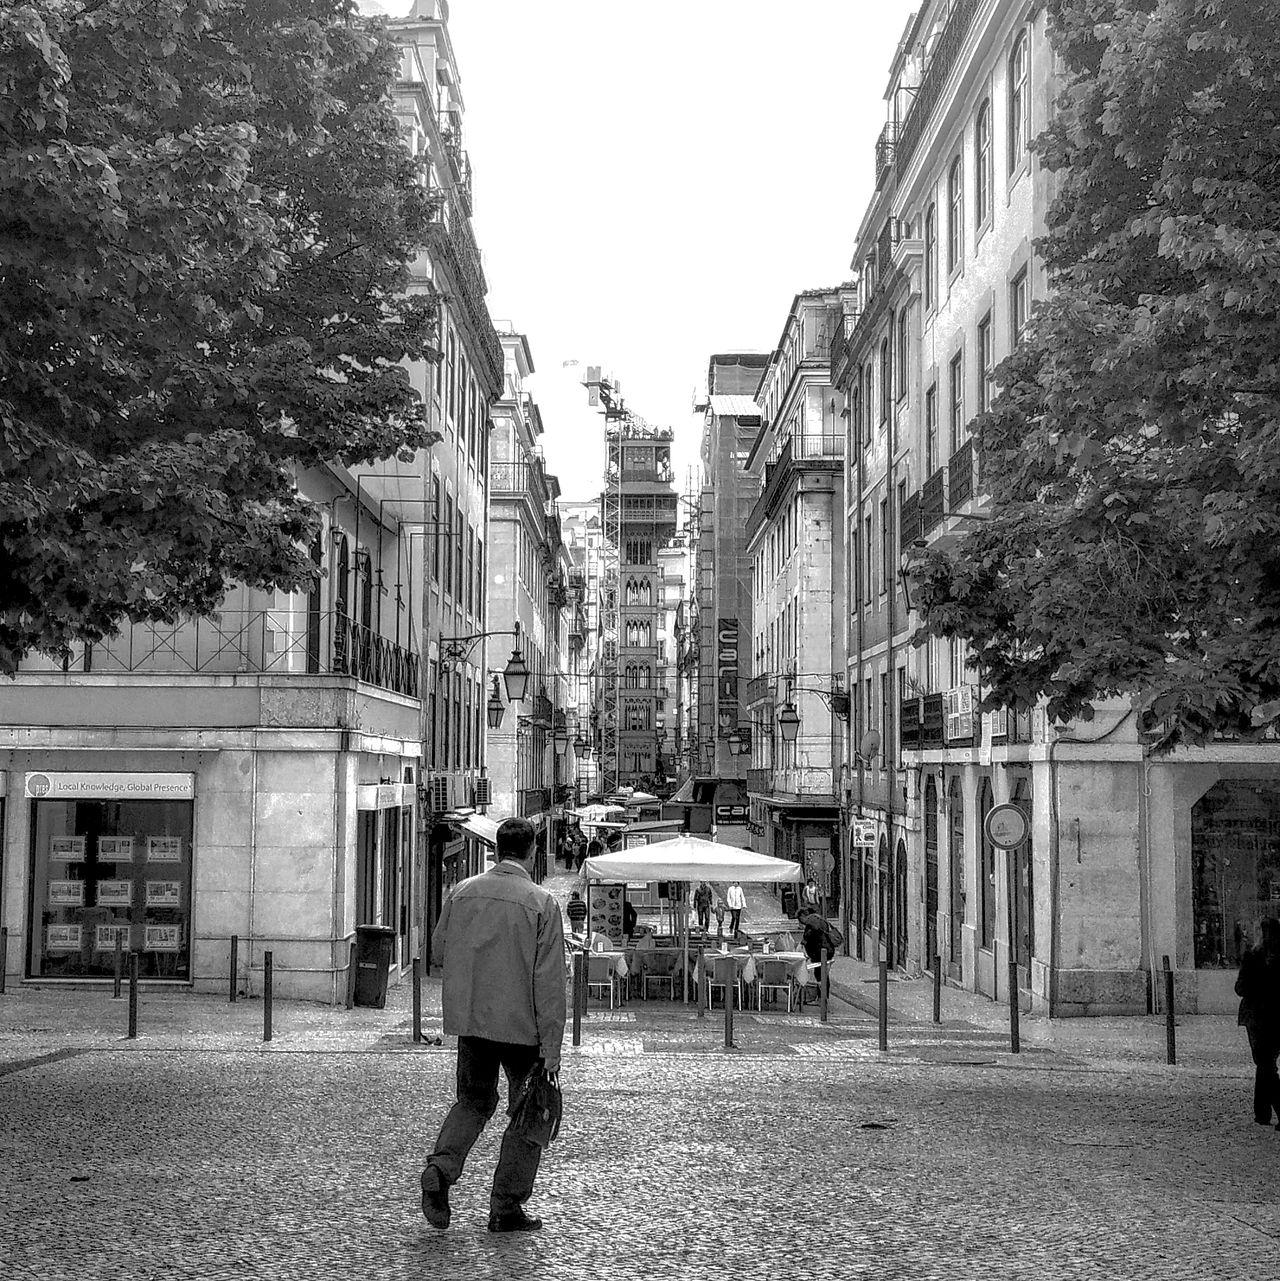 Corredores de Lisboa Architecture Streetphoto_bw Architecture